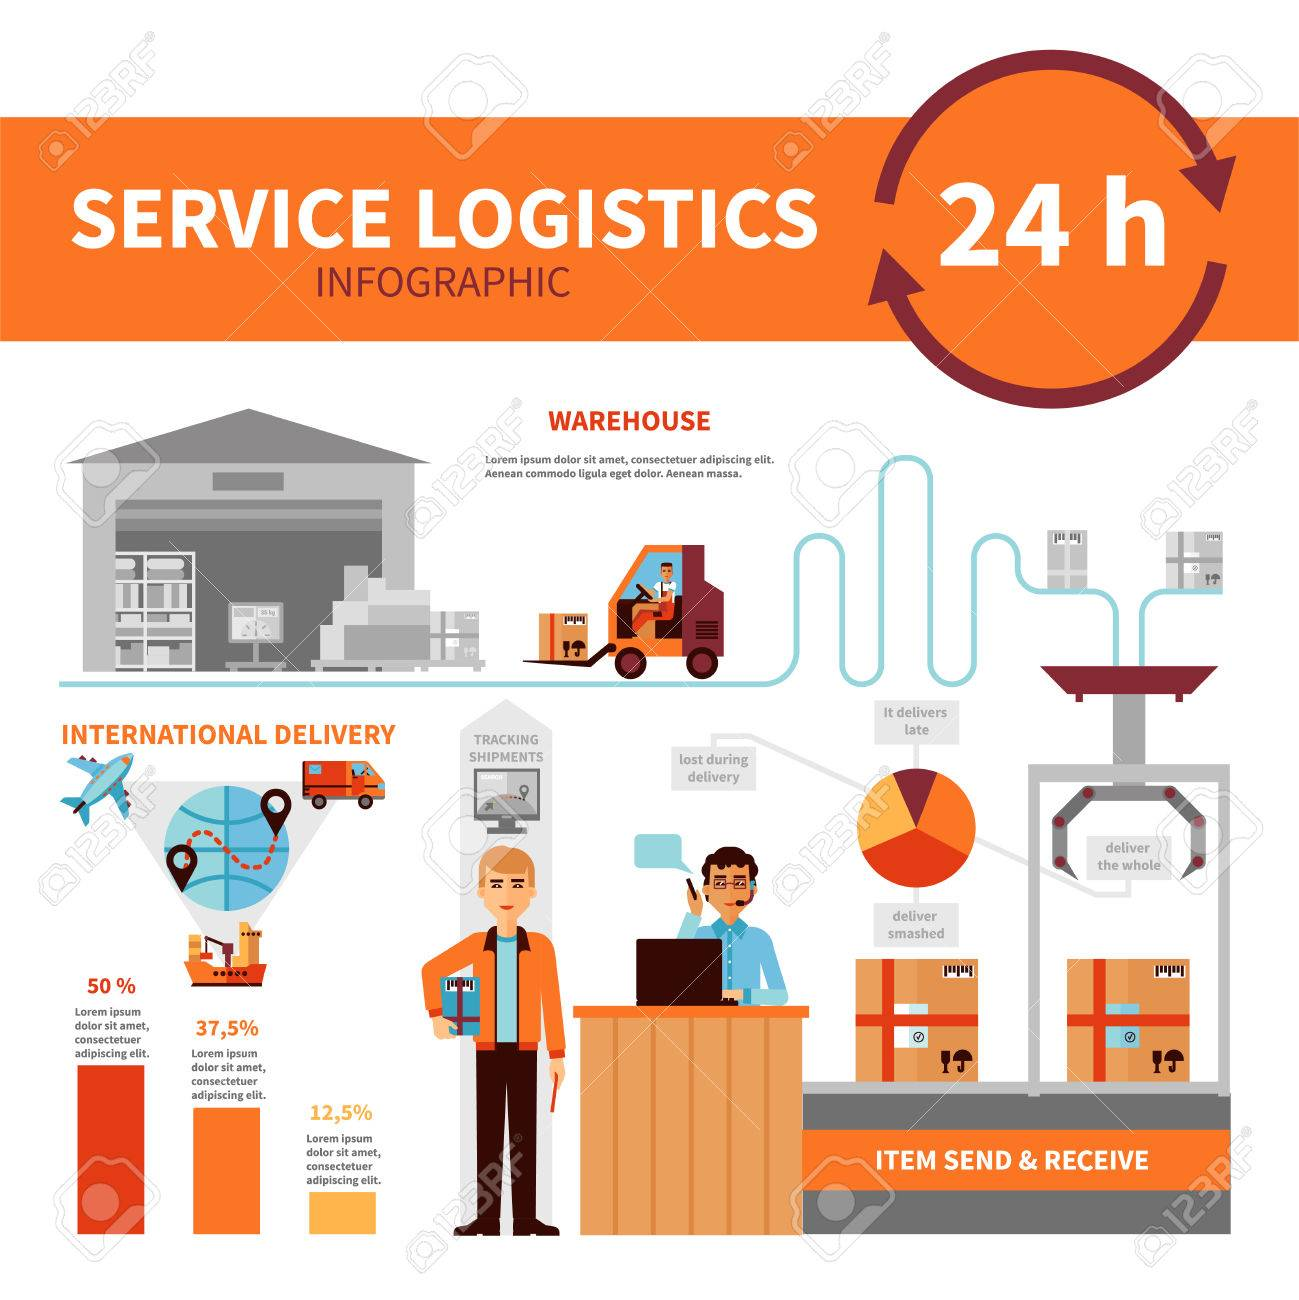 International logistic company service infographic presentation